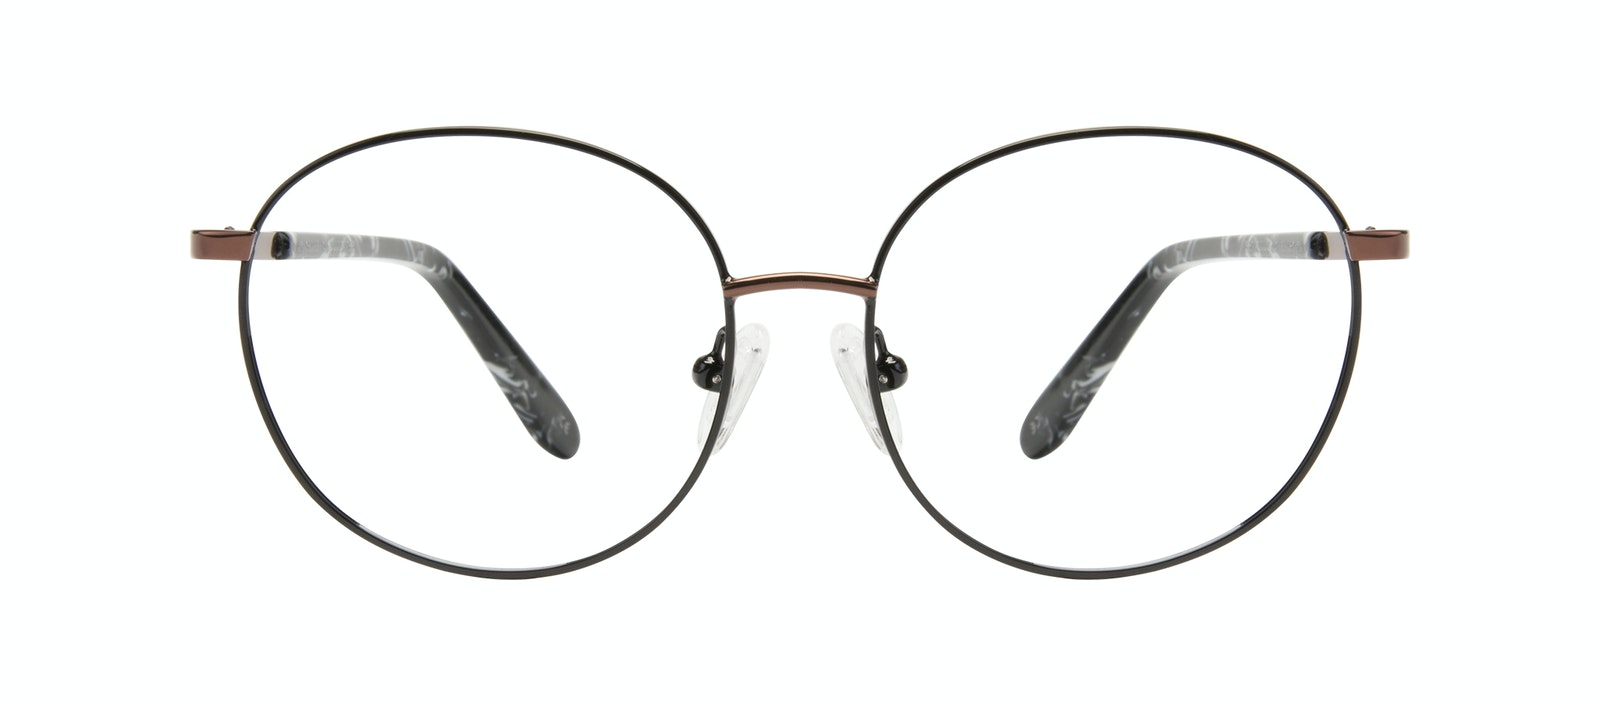 Affordable Fashion Glasses Round Eyeglasses Women Joy Petite Black Copper Front